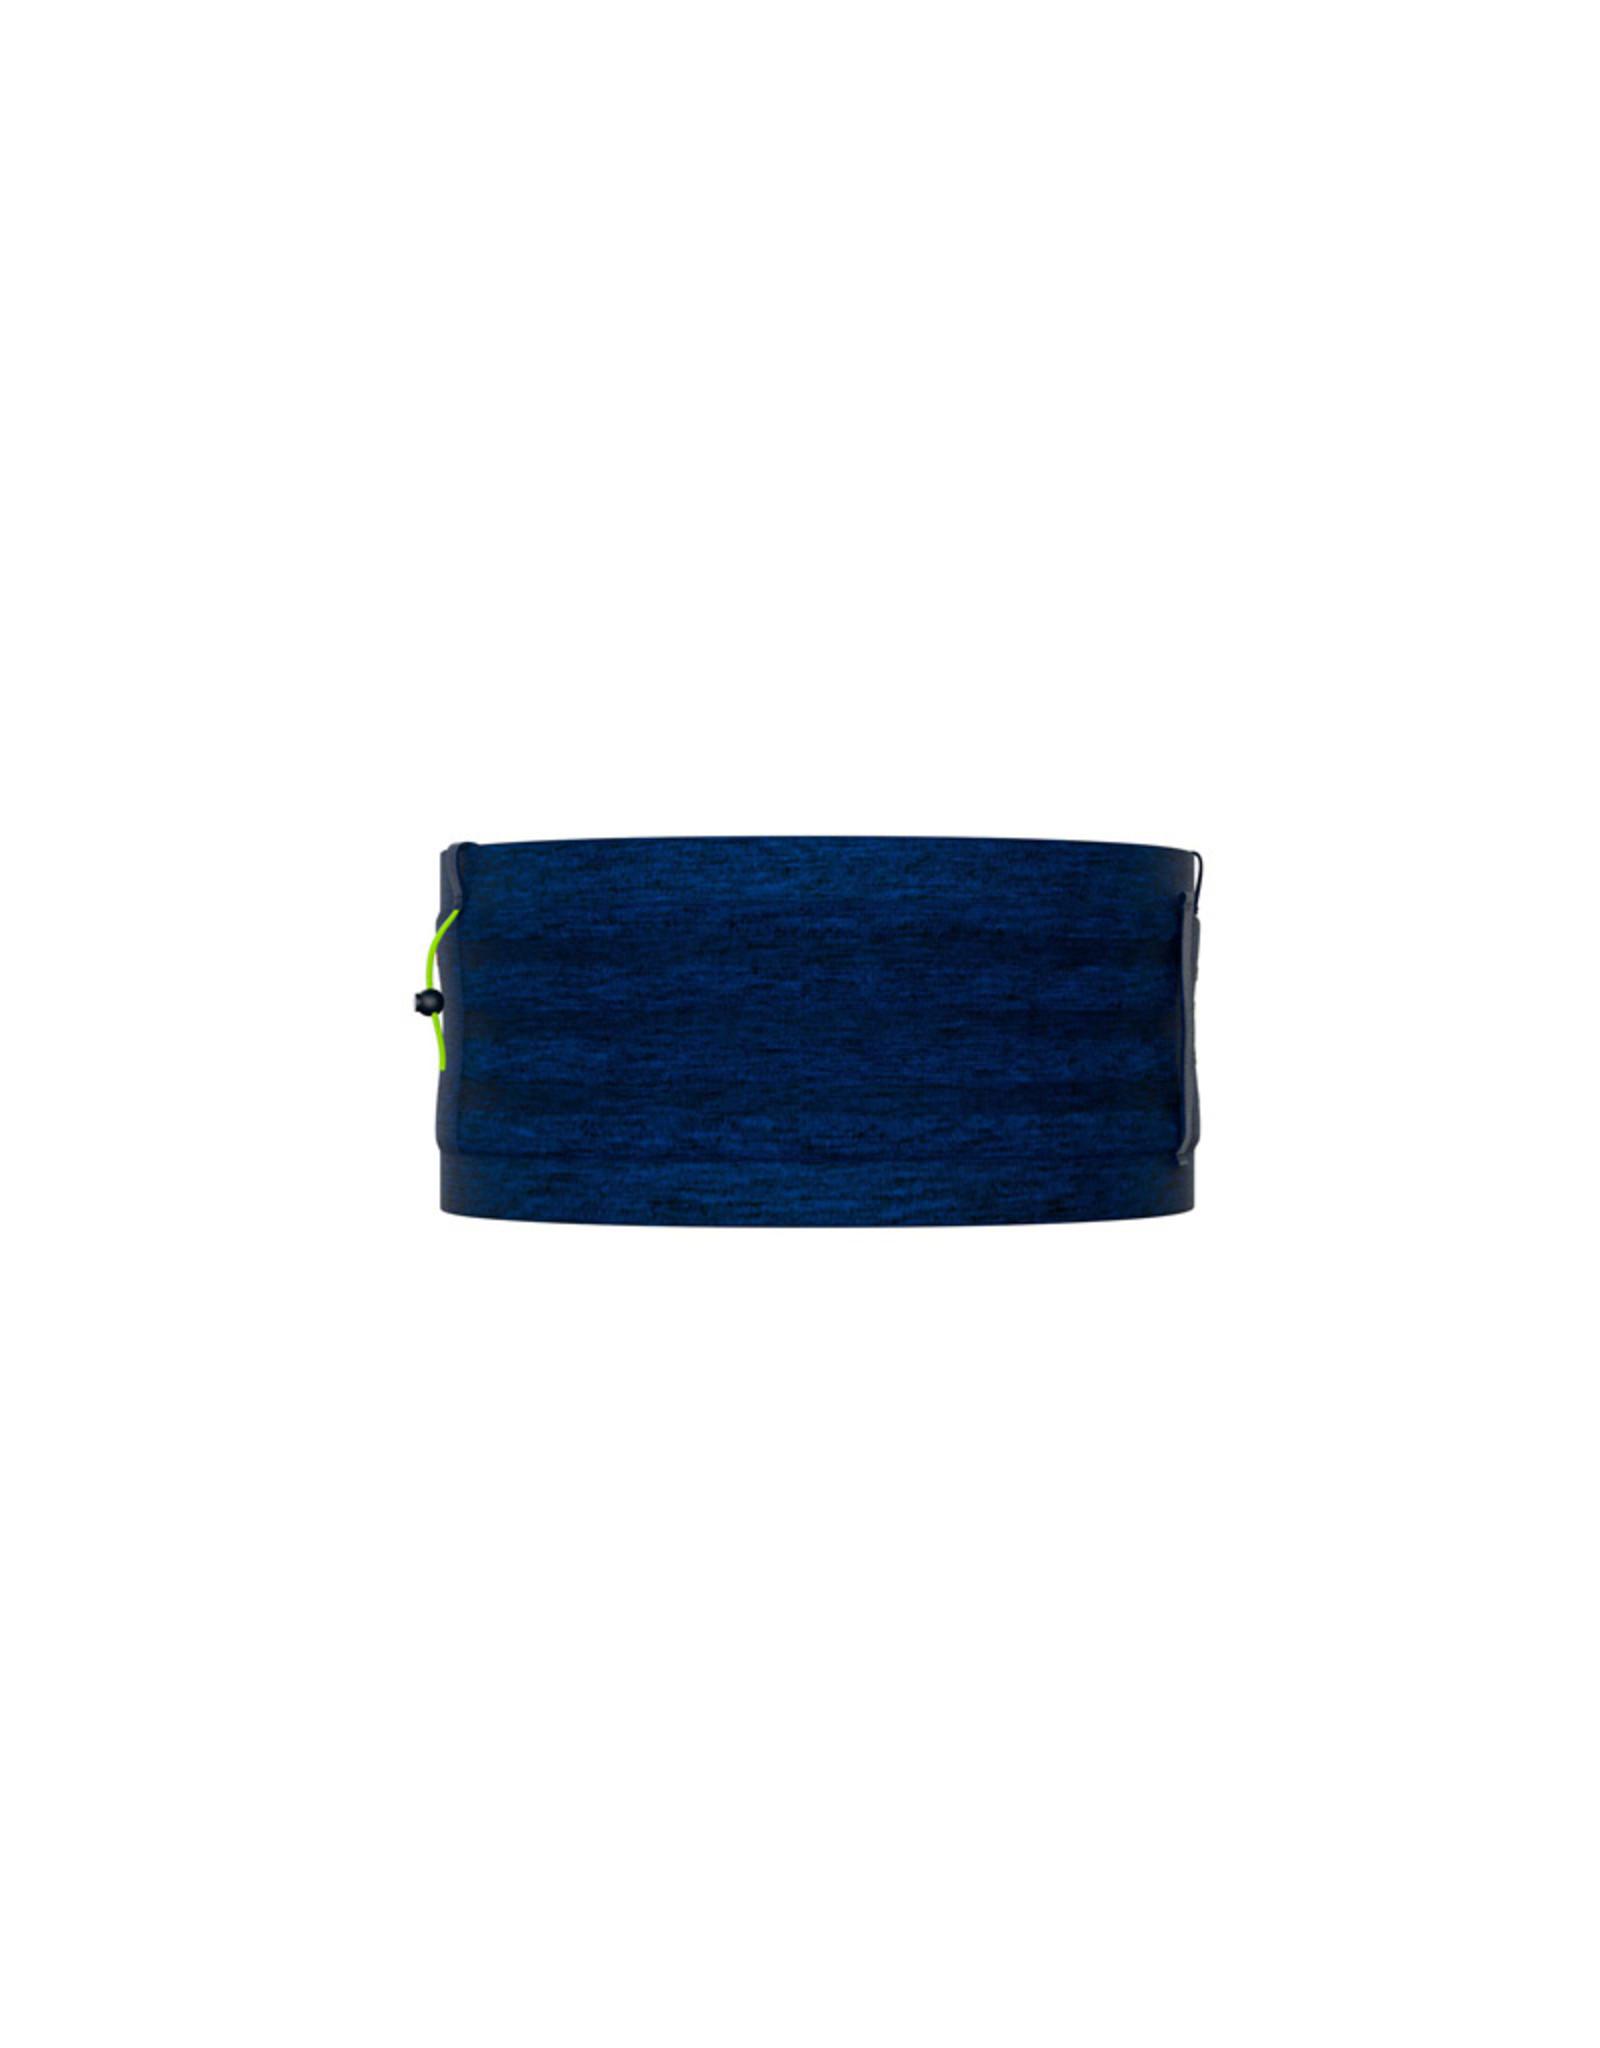 Compressport Free Belt Pro Ceinture Hanche - Bleu